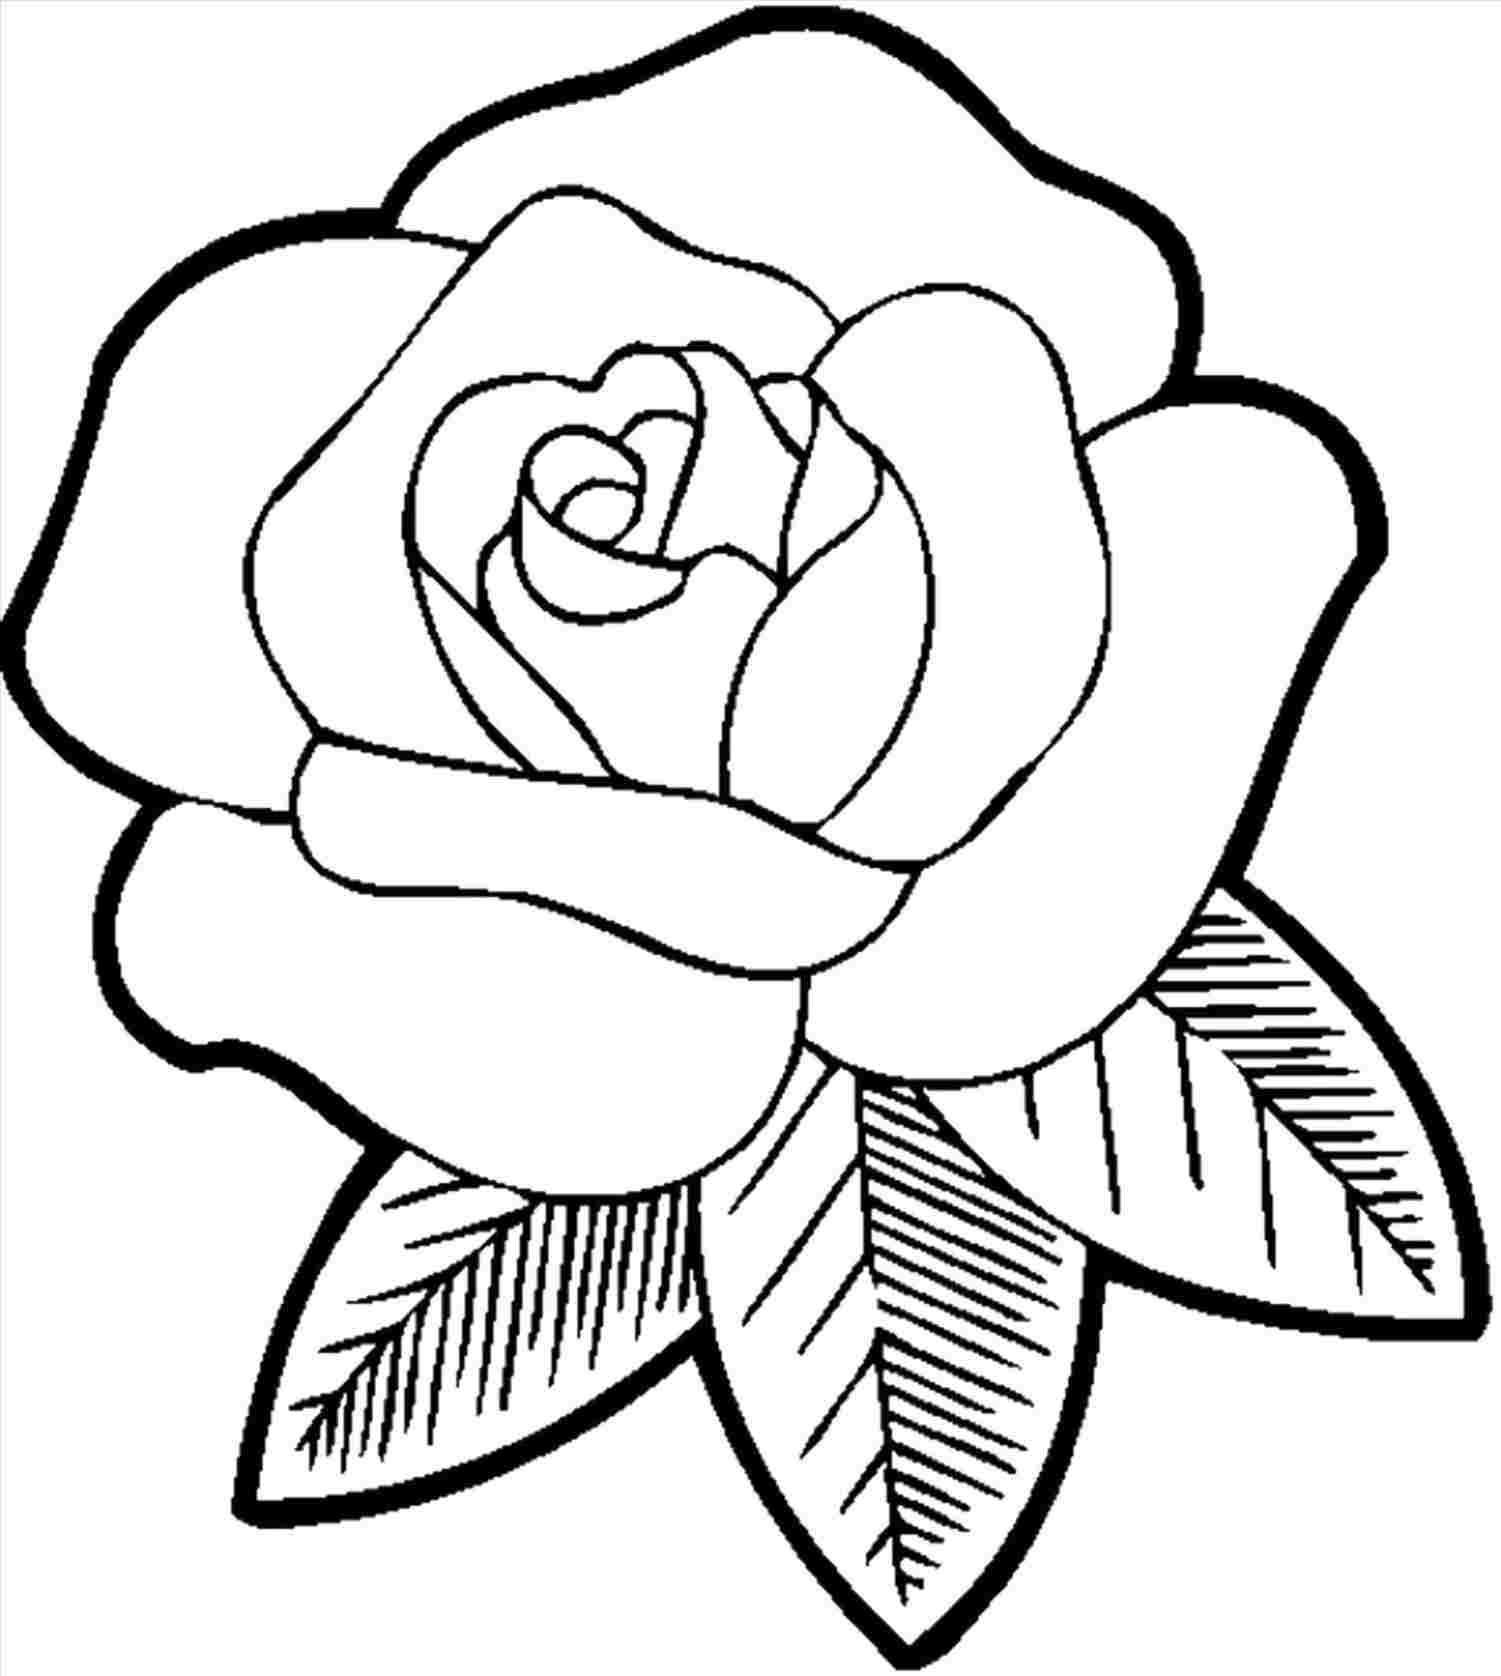 1501x1676 Simple Rose Pencil Drawing Step